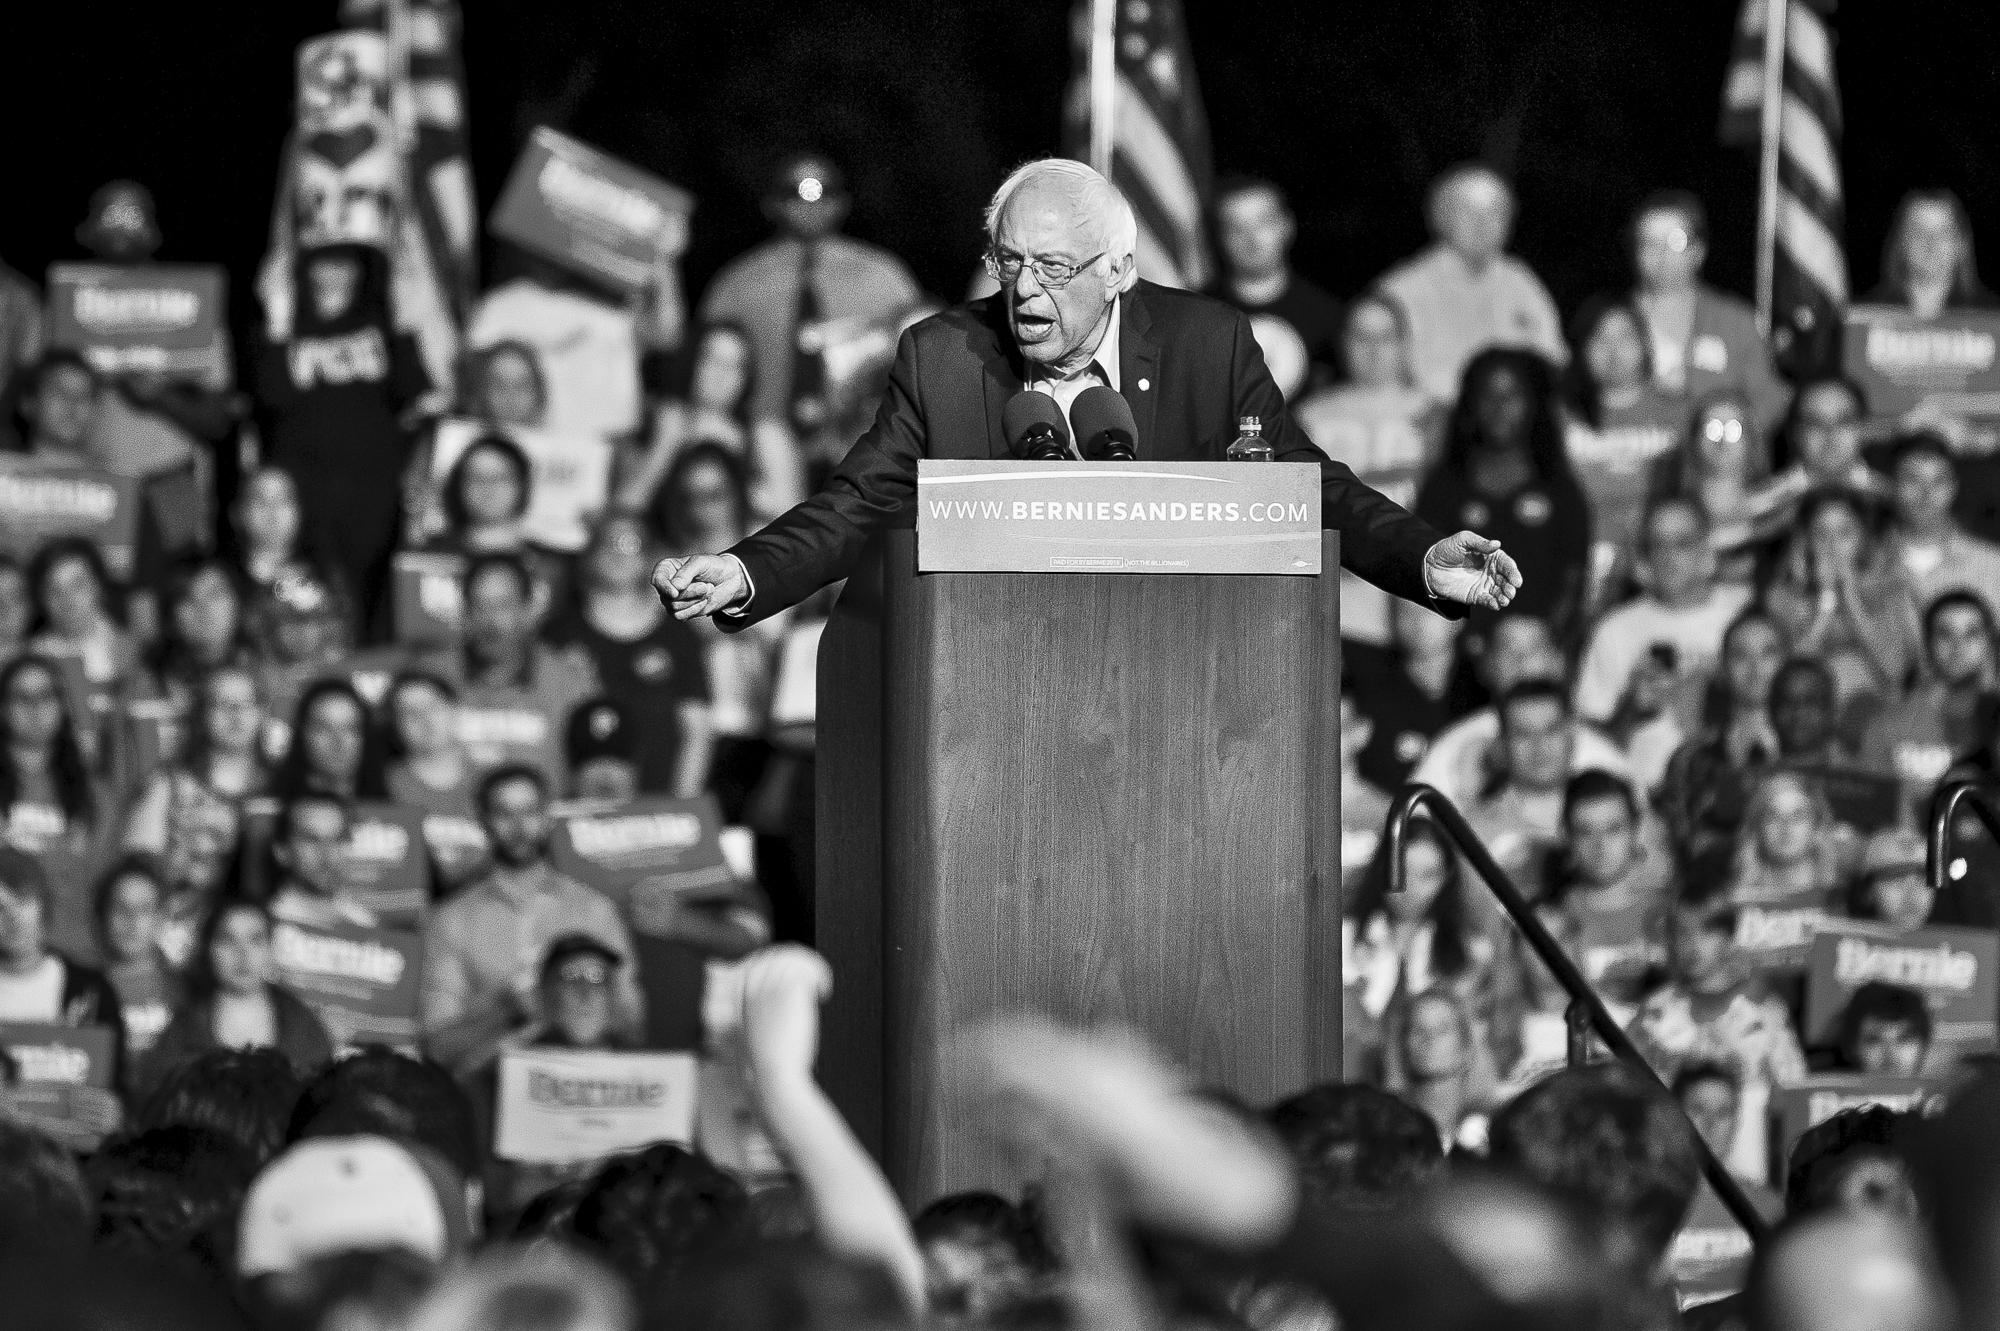 Bernie Sanders Campaigns in Manassas Va. Pete Marovich